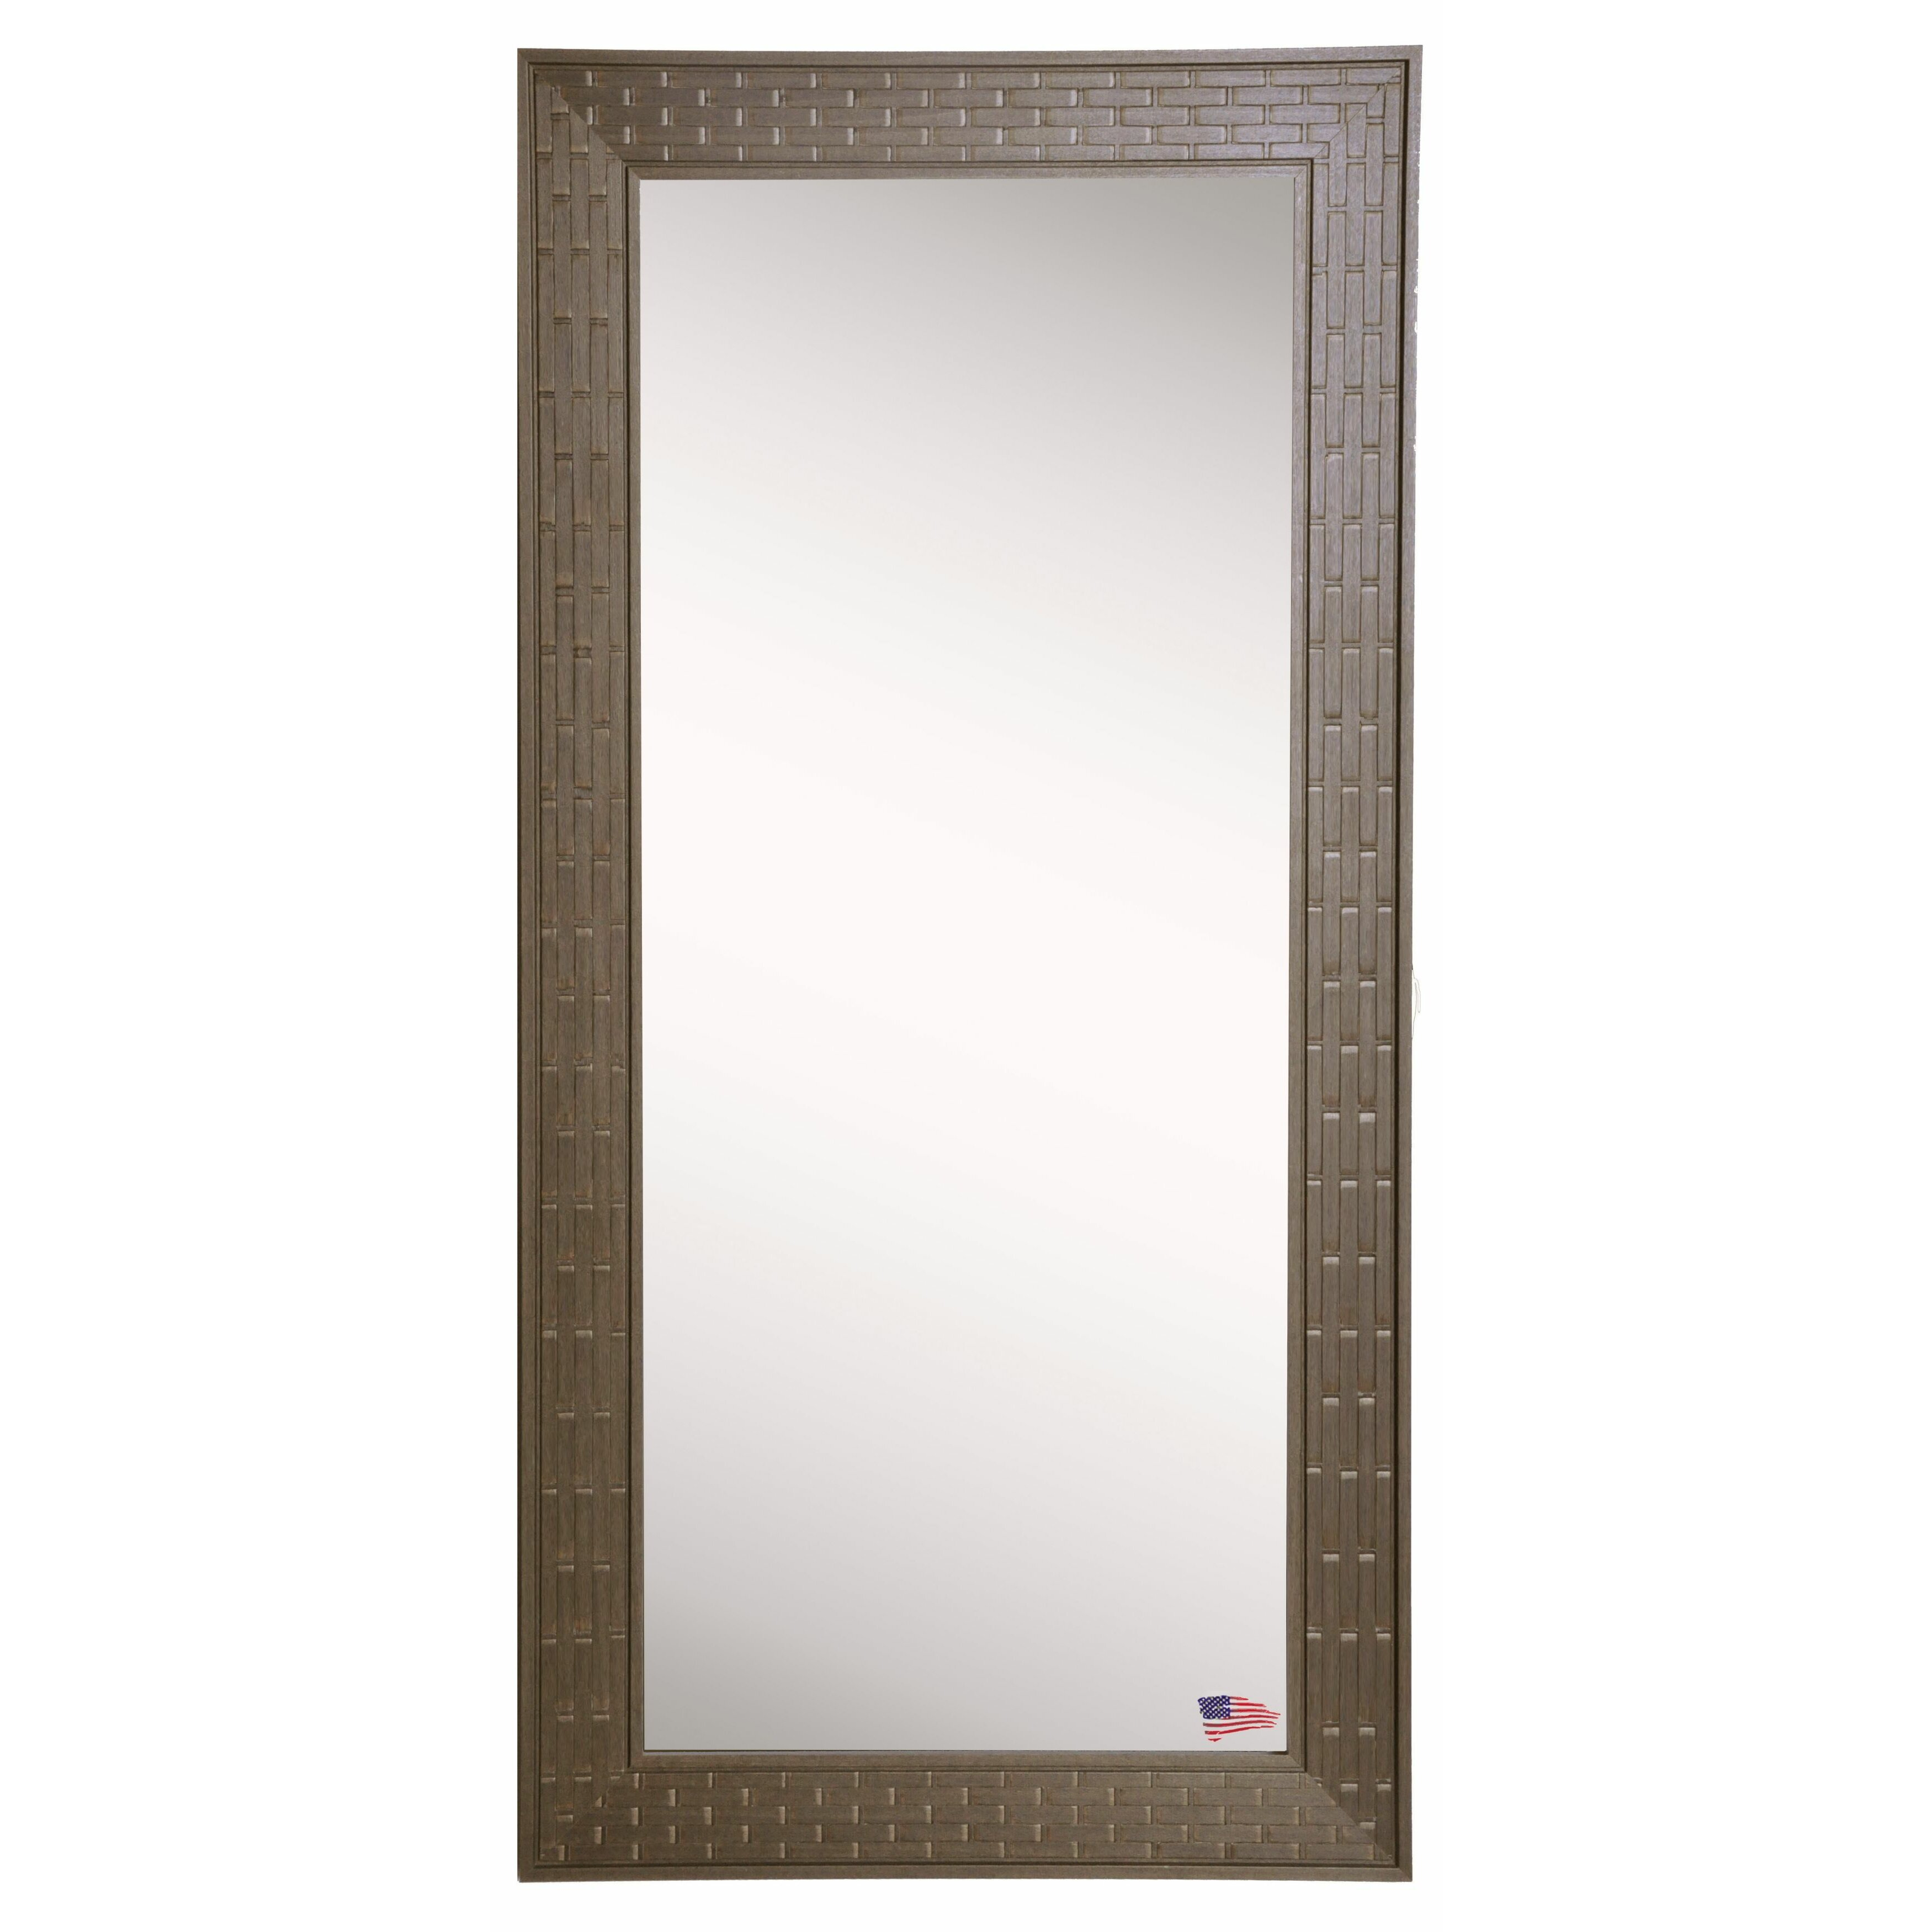 Rayne mirrors jovie jane bricks tall mirror wayfair for Tall glass mirror